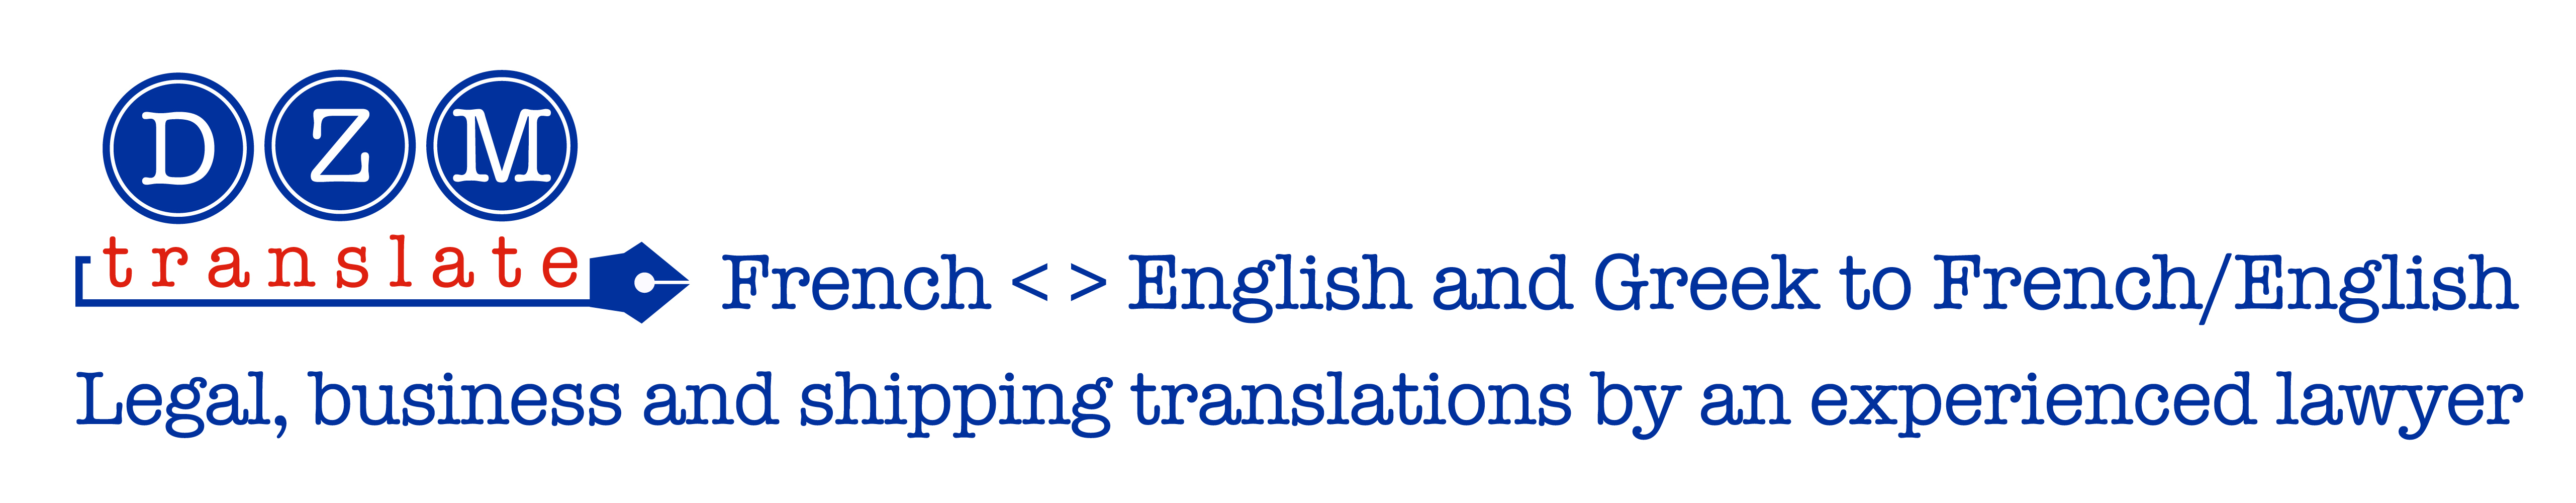 DZM translate